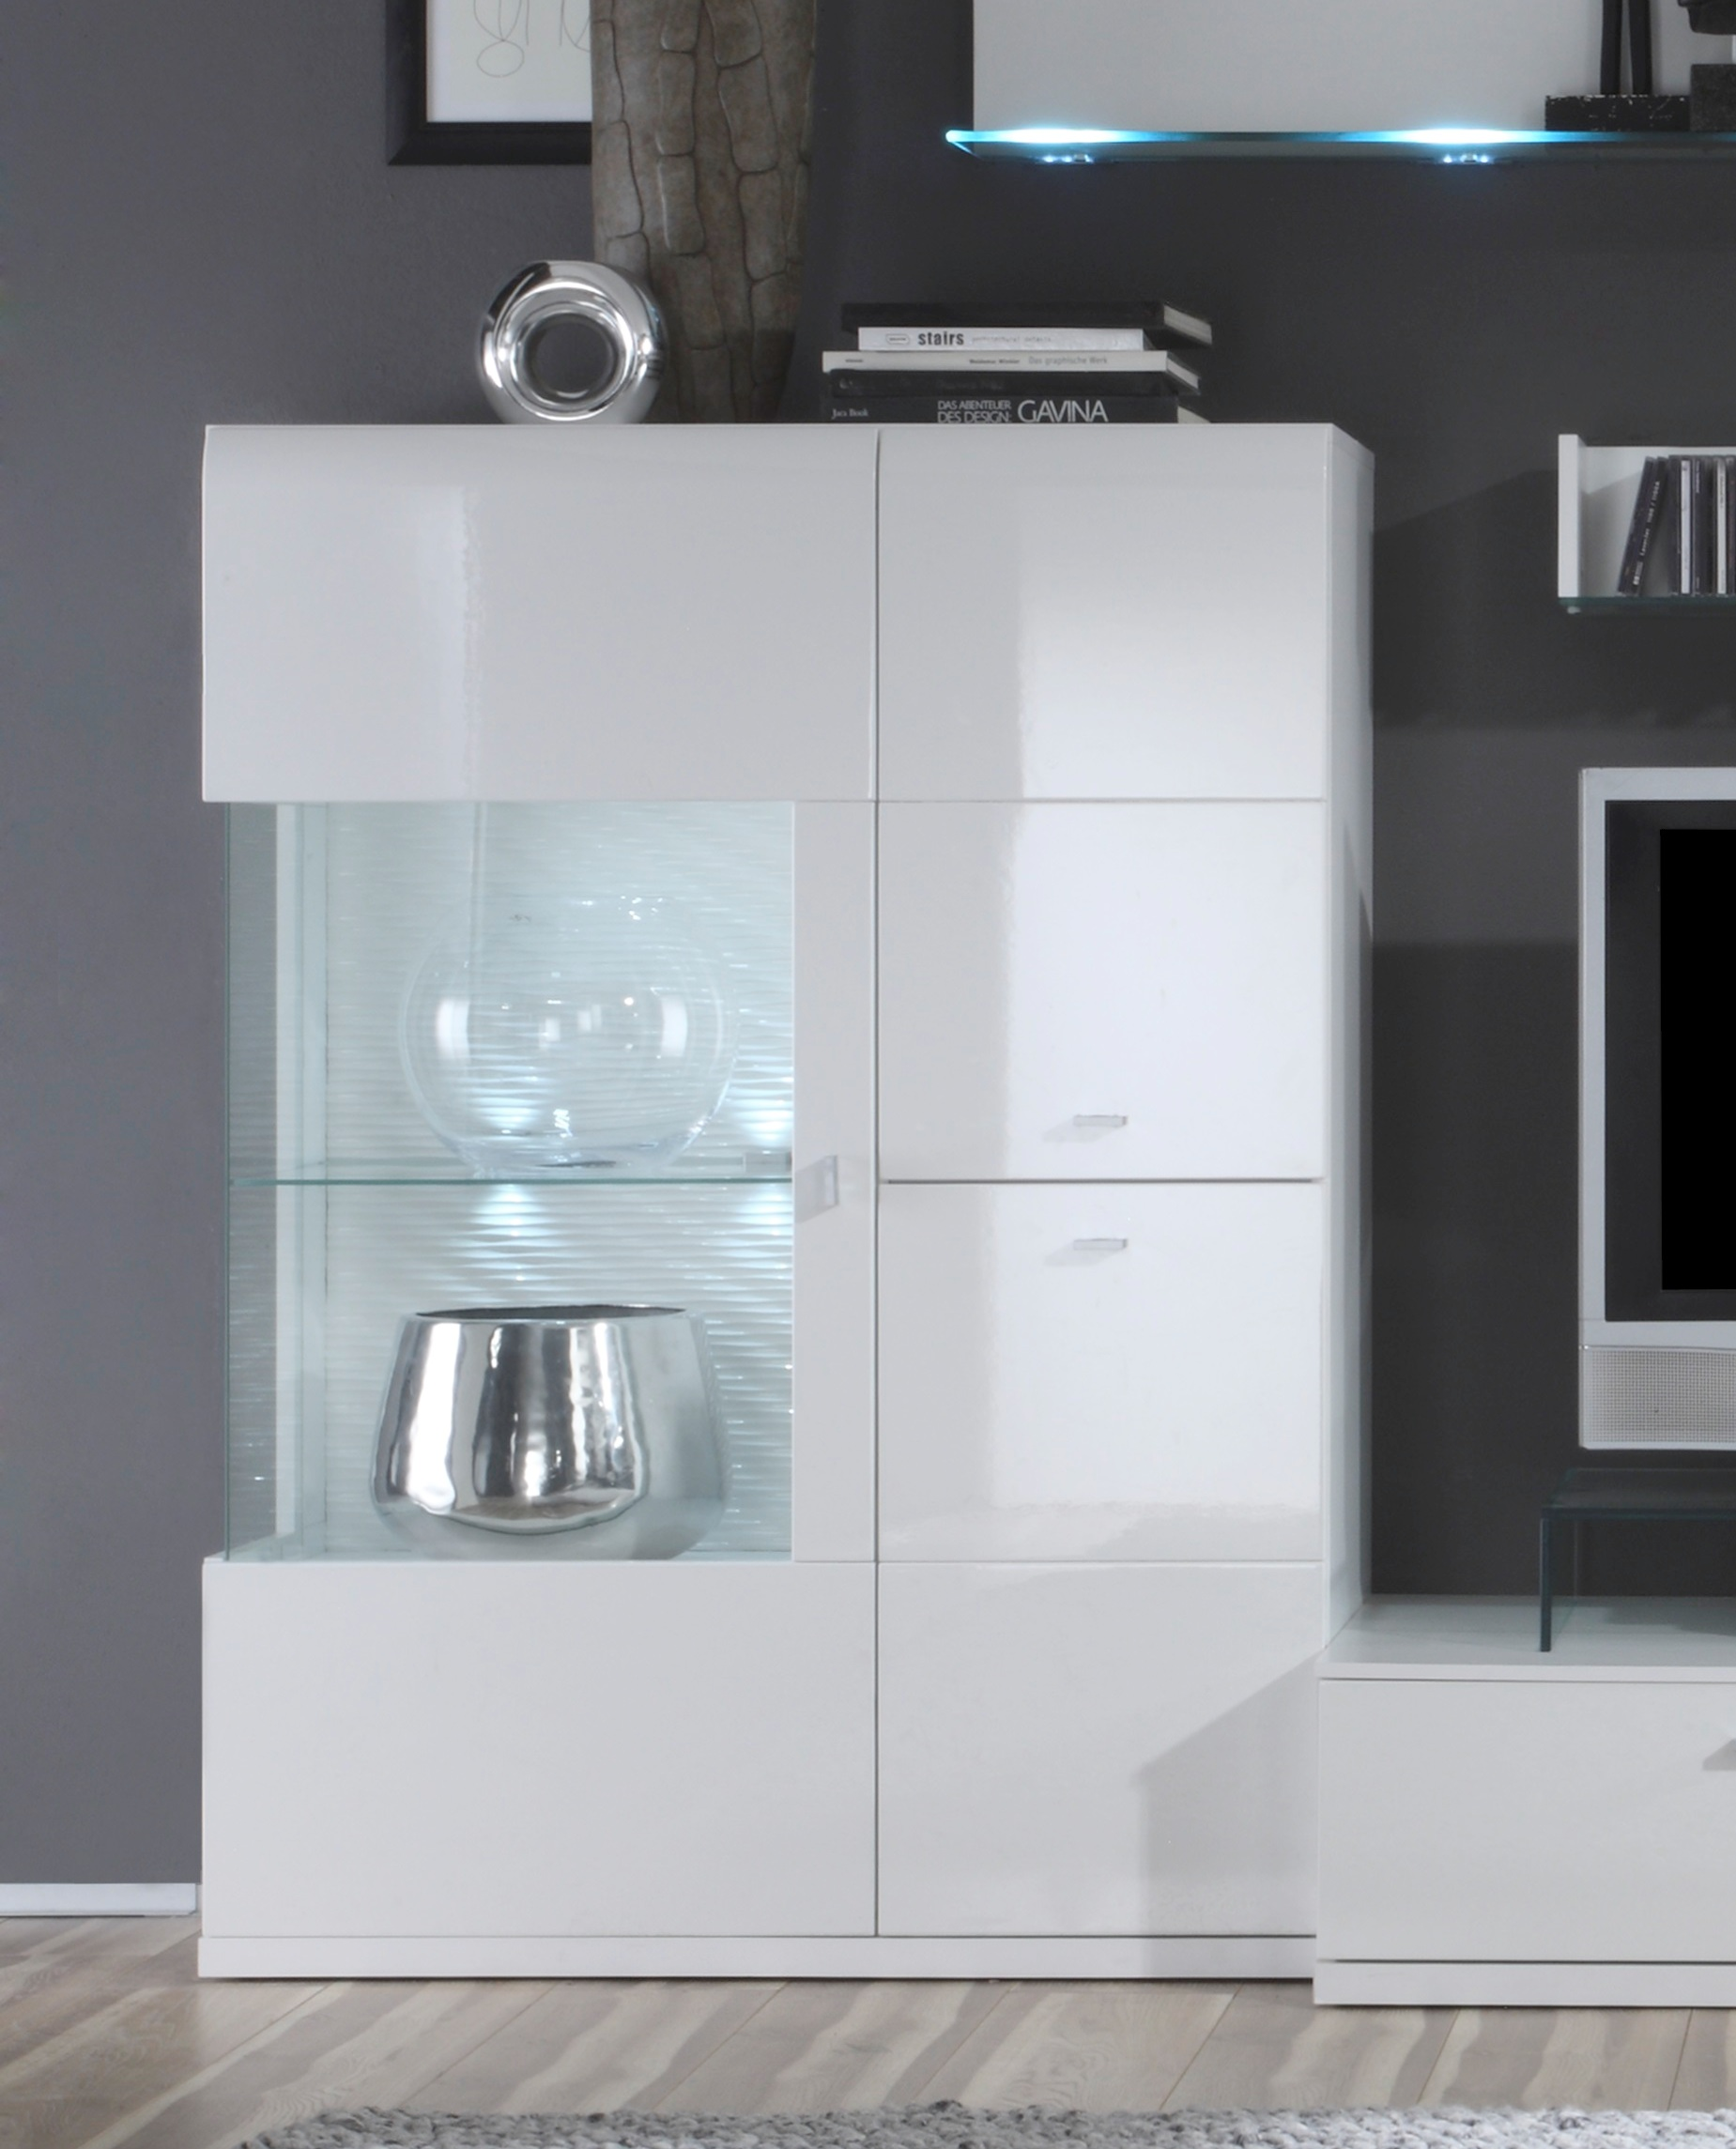 esszimmer vitrinen moderne vitrine aus eiche glas contract vitrina by hierve case esszimmer. Black Bedroom Furniture Sets. Home Design Ideas